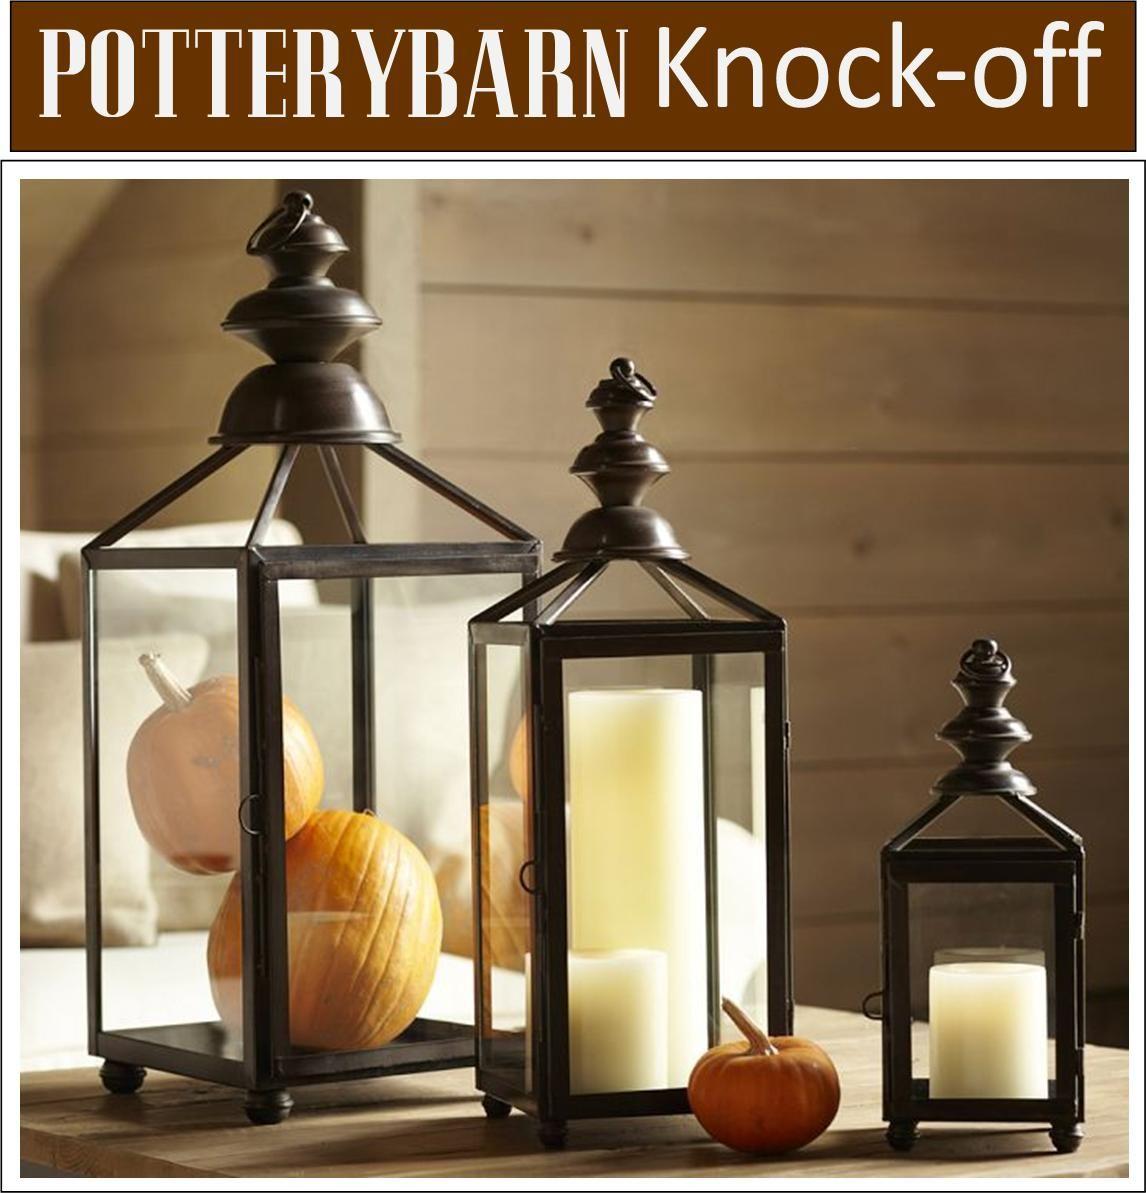 Pottery Barn Lamp Knock Off: Pottery Barn Weston Lantern / Lamp Knock-Off TUTORIAL